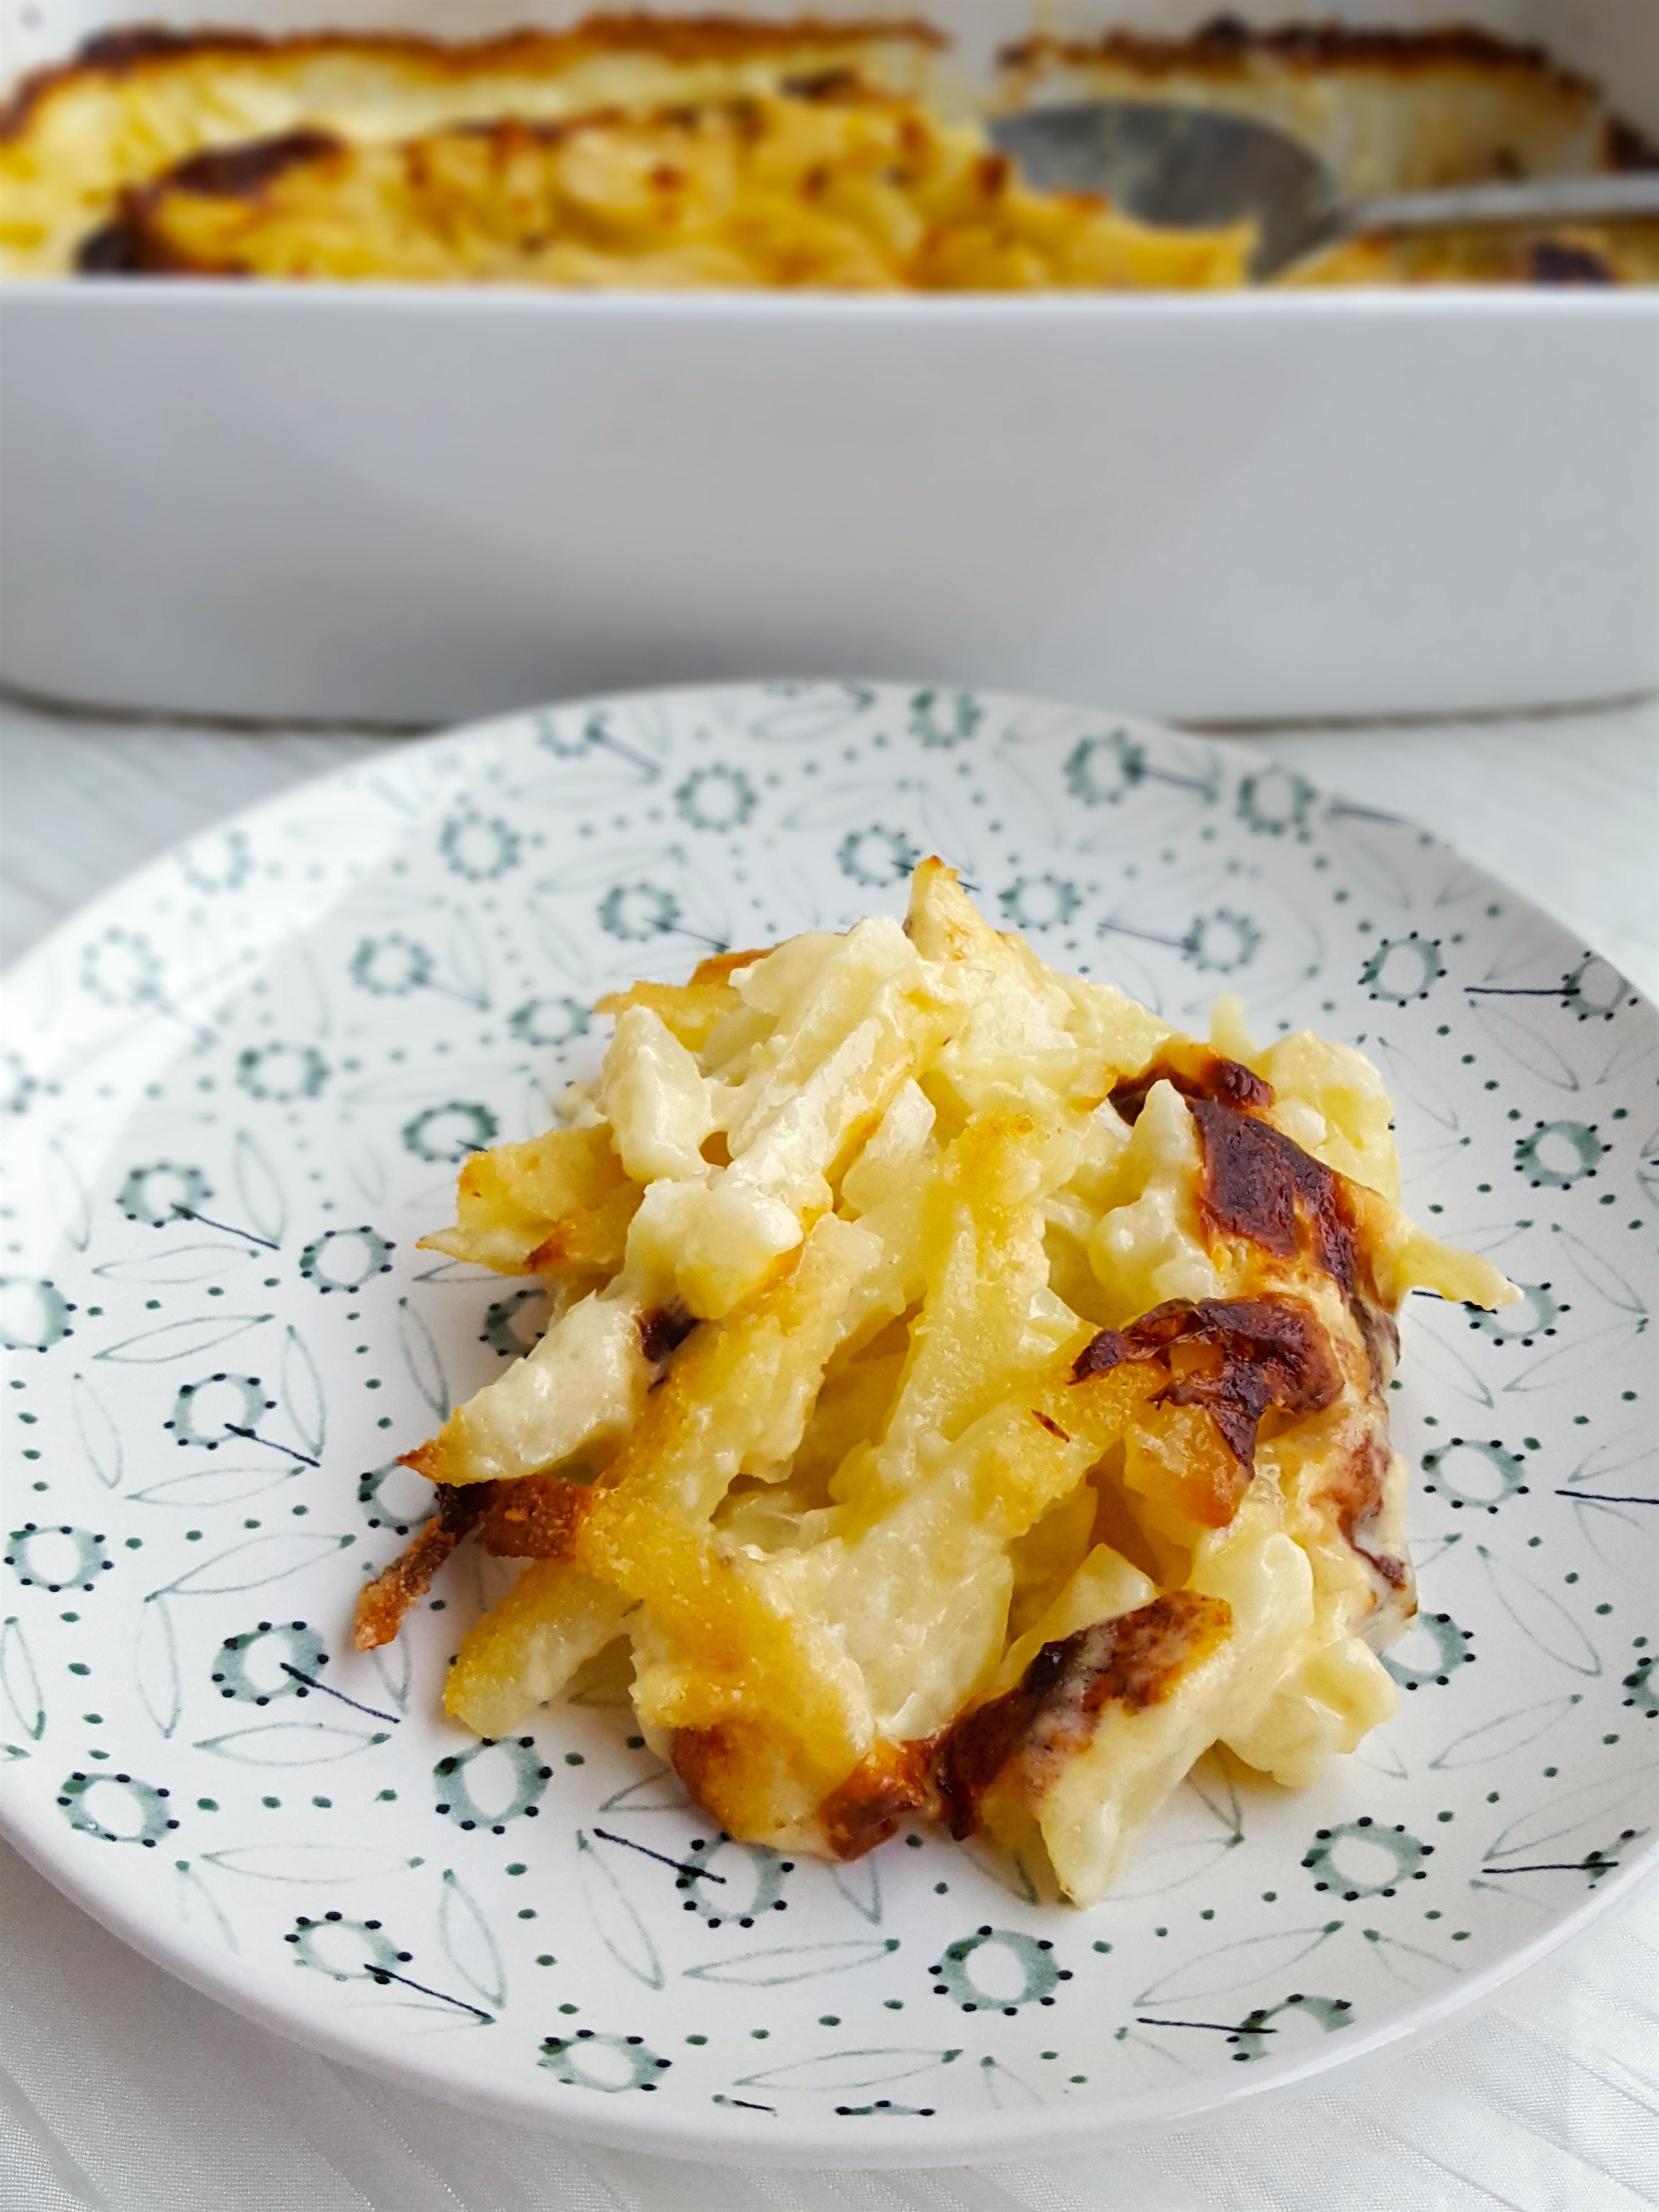 vilken sorts potatis till janssons frestelse